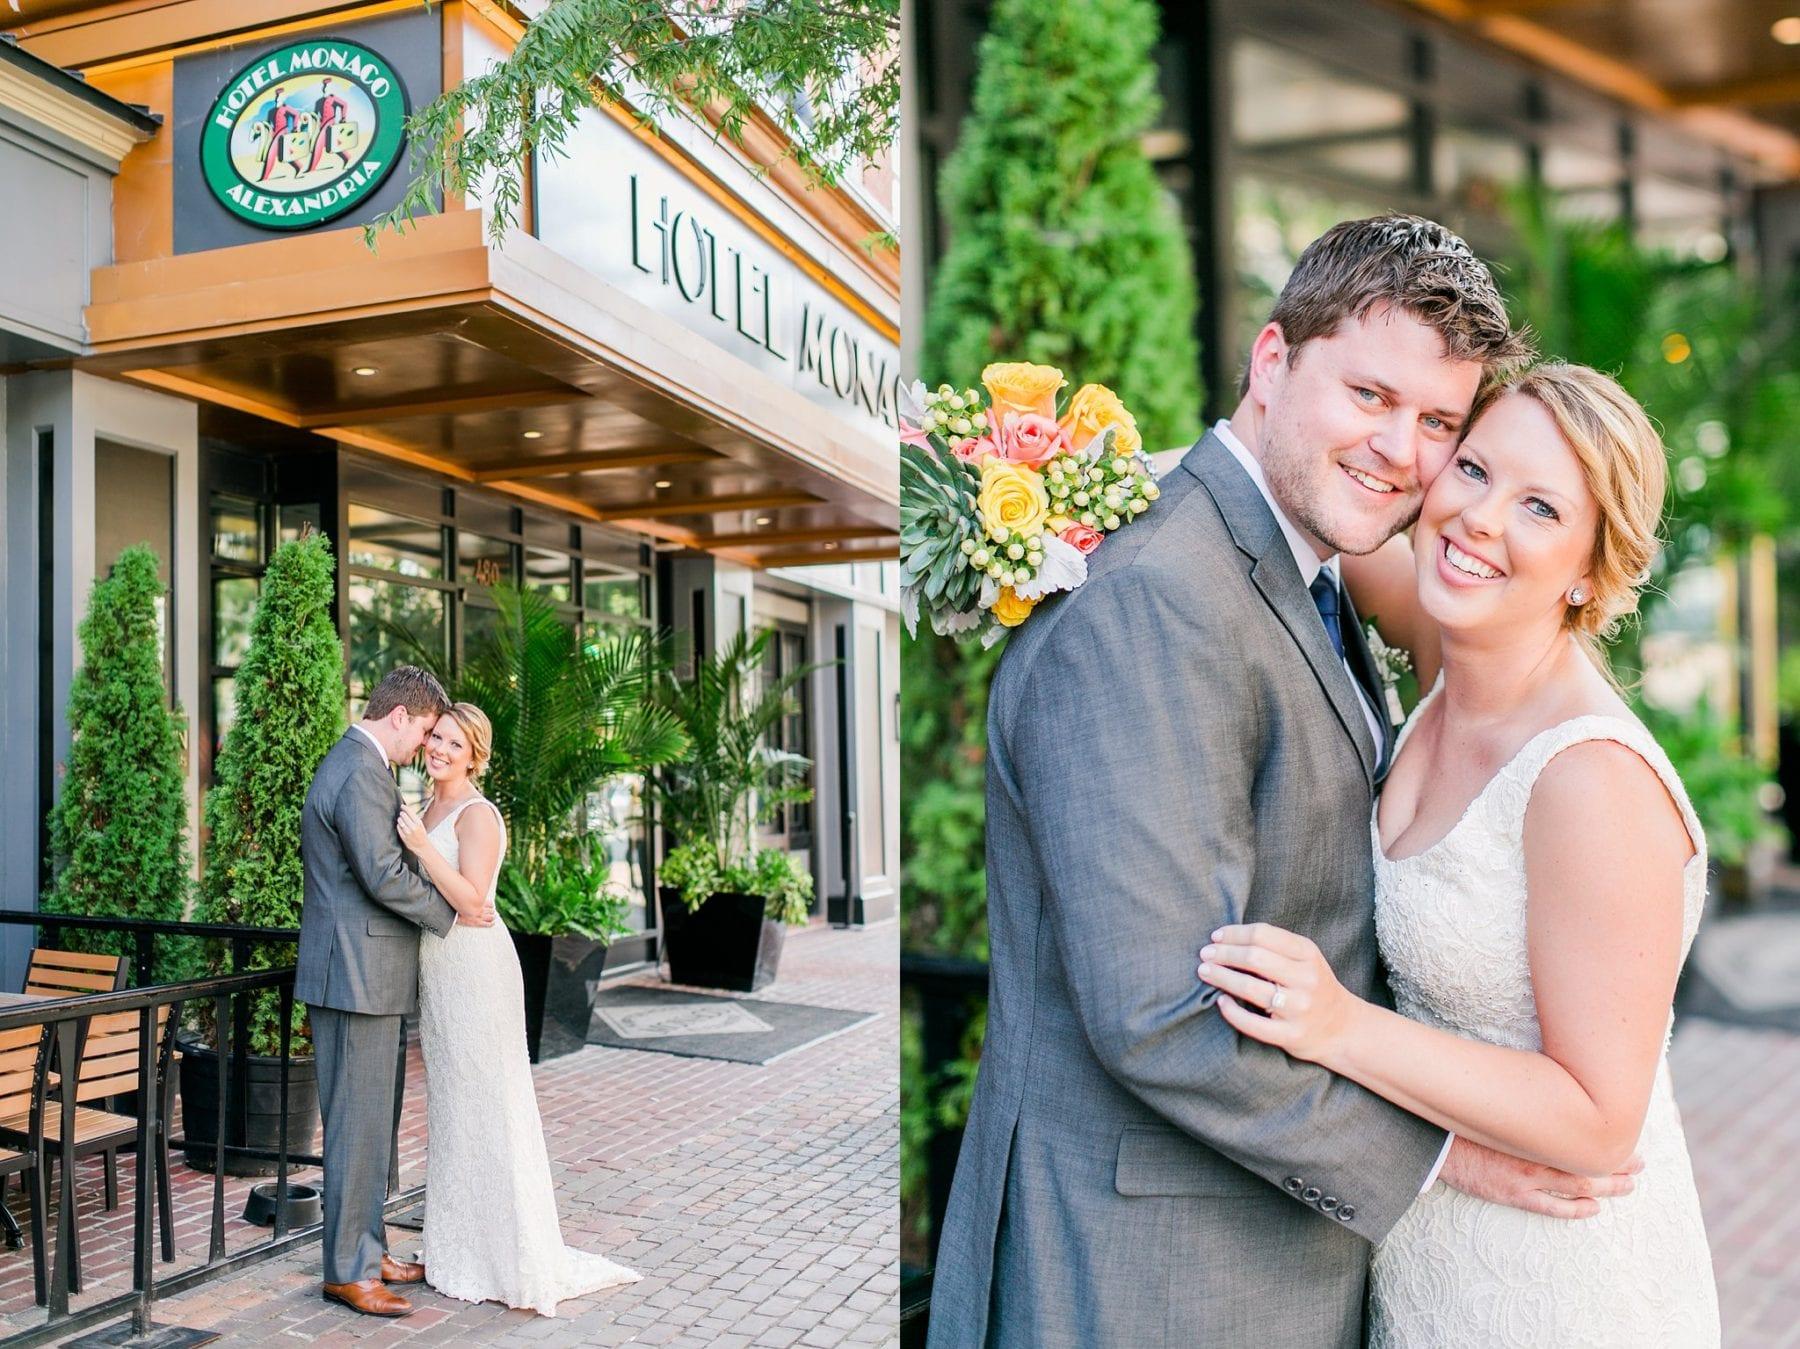 Hotel Monaco Wedding Photos Virginia Wedding Photographer Megan Kelsey Photography Kevin & Morgan-237.JPG